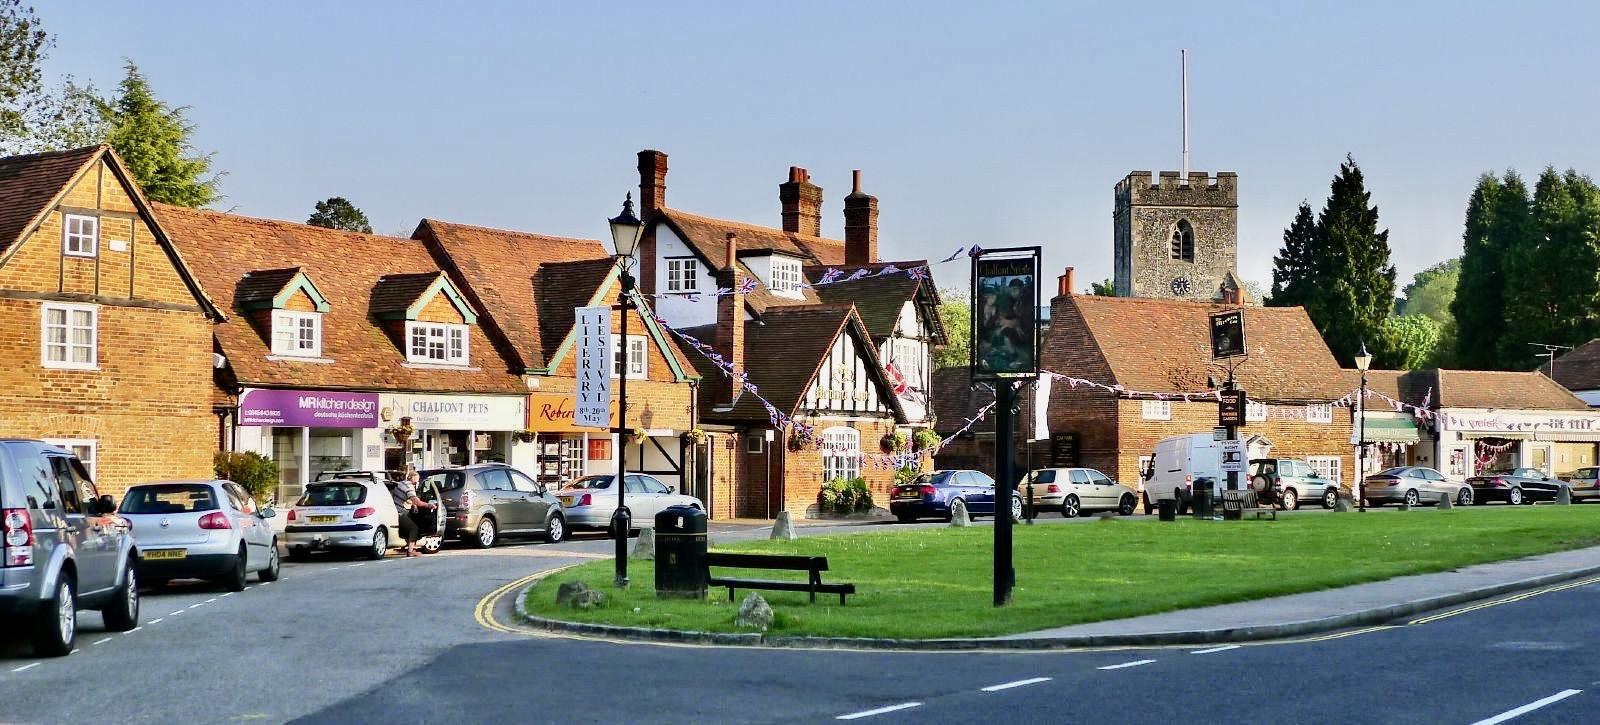 Chalfont St Giles Village England.